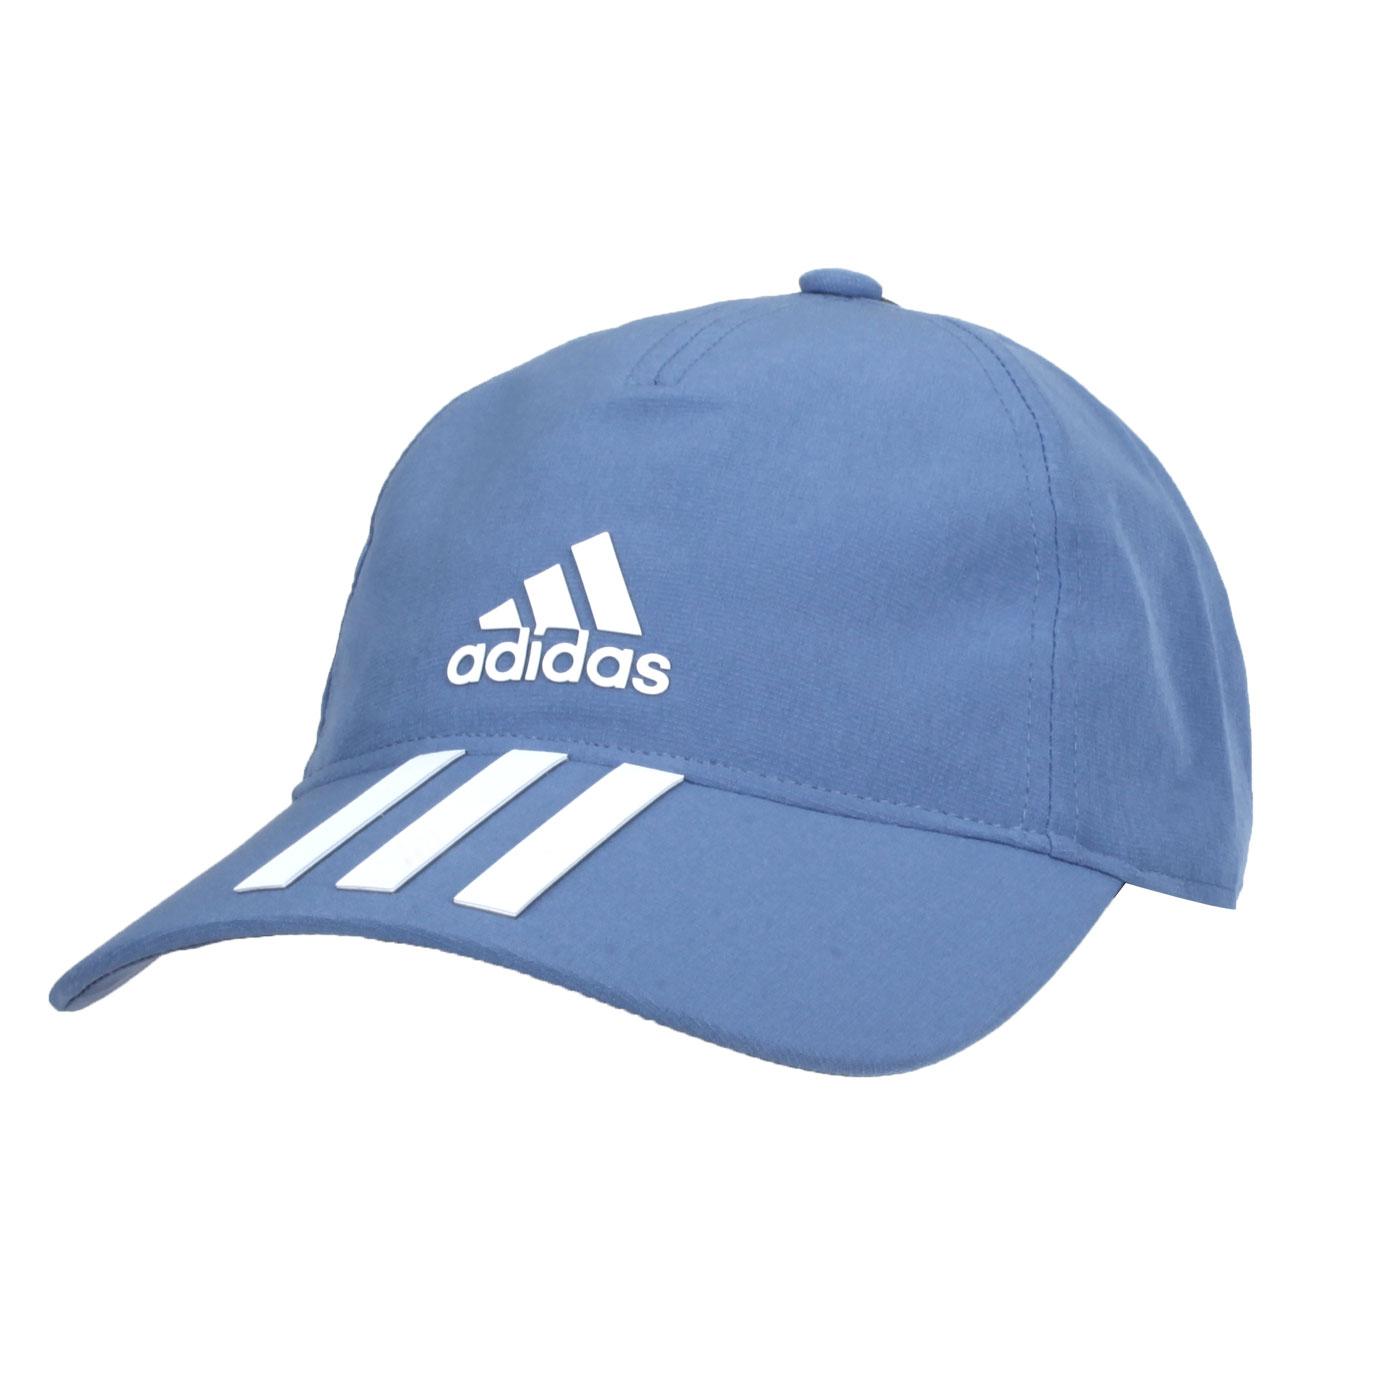 ADIDAS 帽子 GM6279